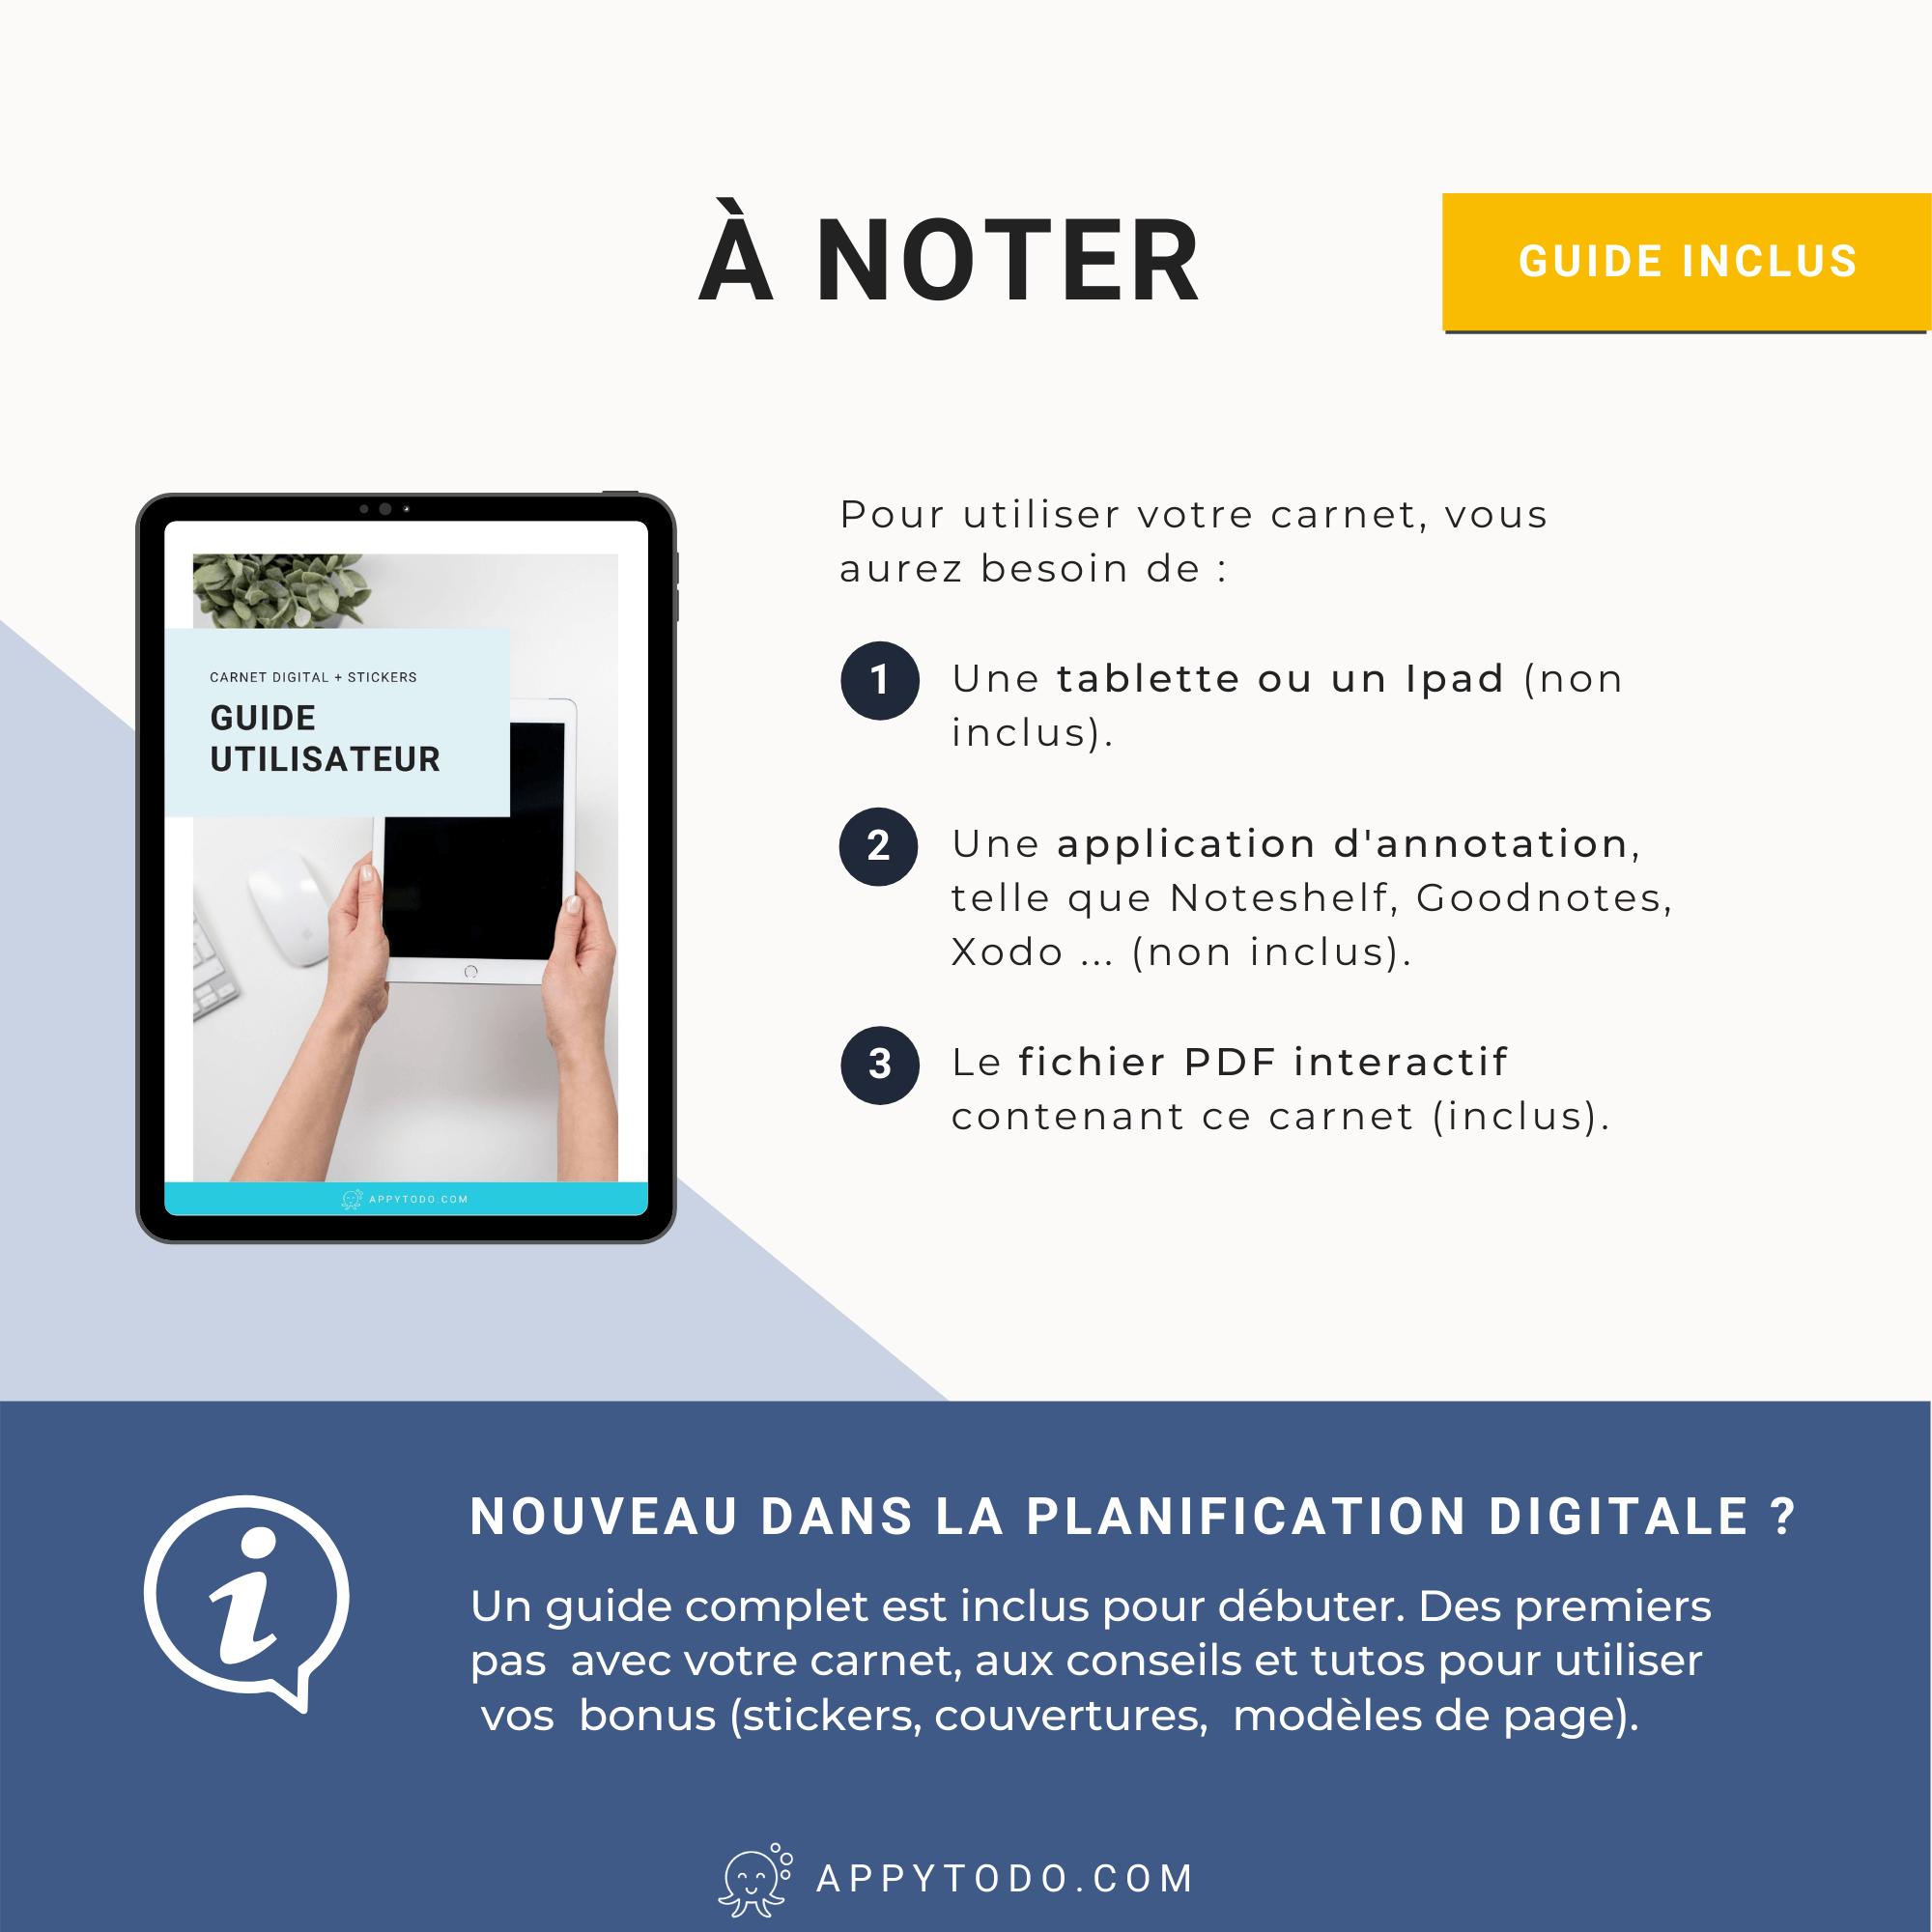 Guide utilisateur carnet digital + stickers